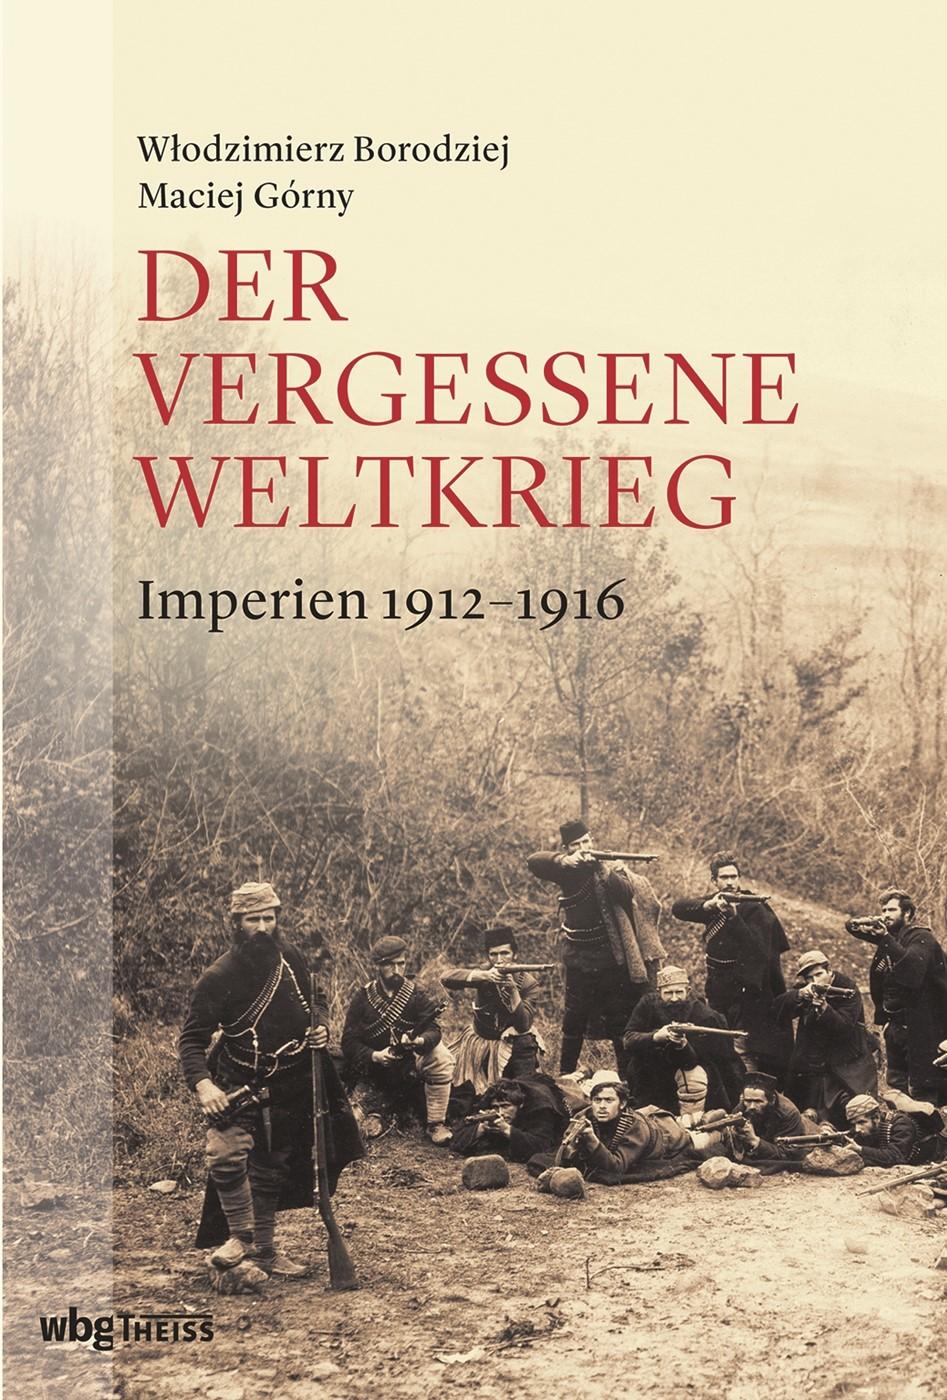 Der vergessene Weltkrieg | Borodziej / Górny, 2018 | Buch (Cover)